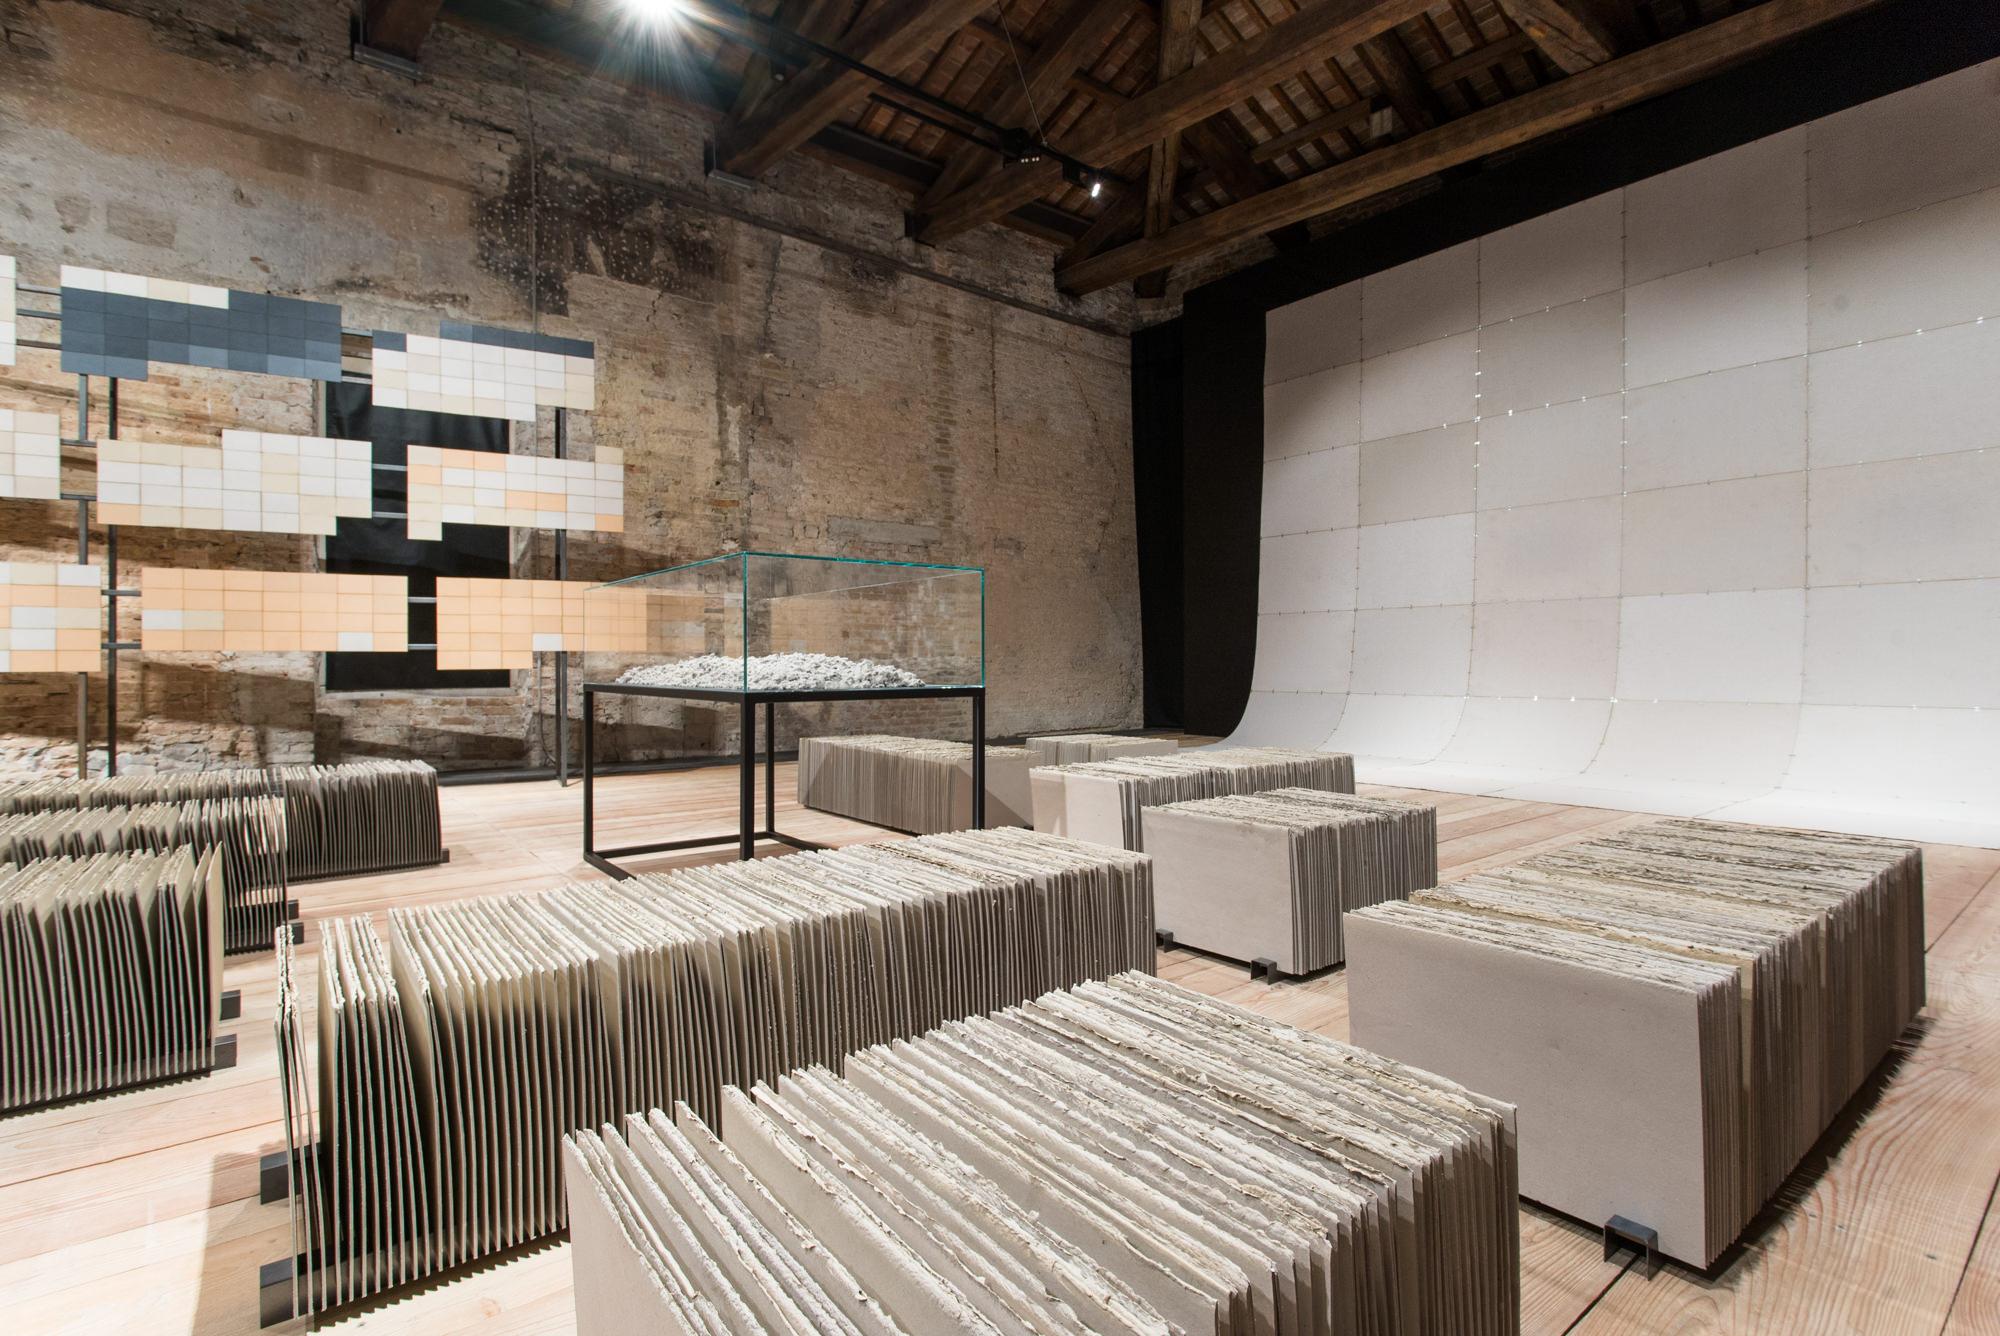 Installation view: Misplaced Ruins,Pavilion of Peru, 56th Biennale di Venezia, 2015 |  | ProjecteSD